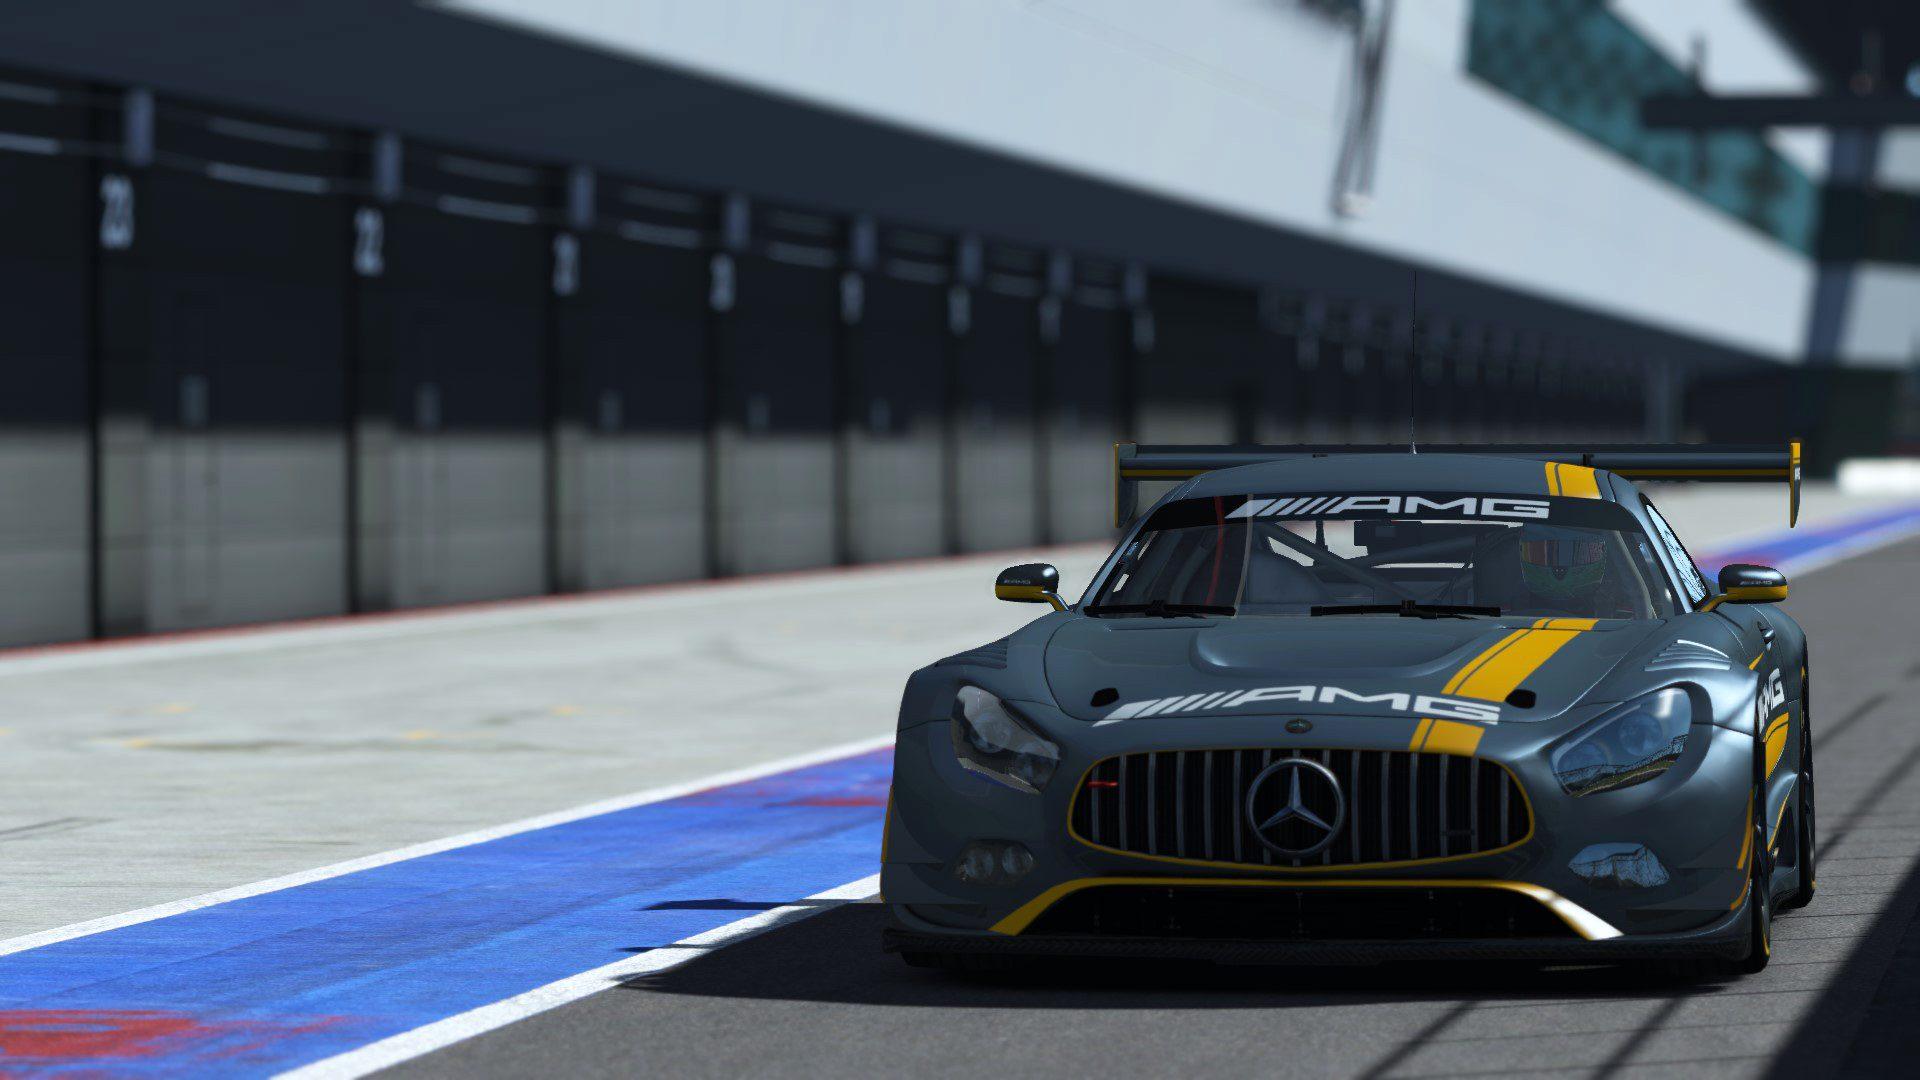 Mercedes_Promo-1920x1080.jpg